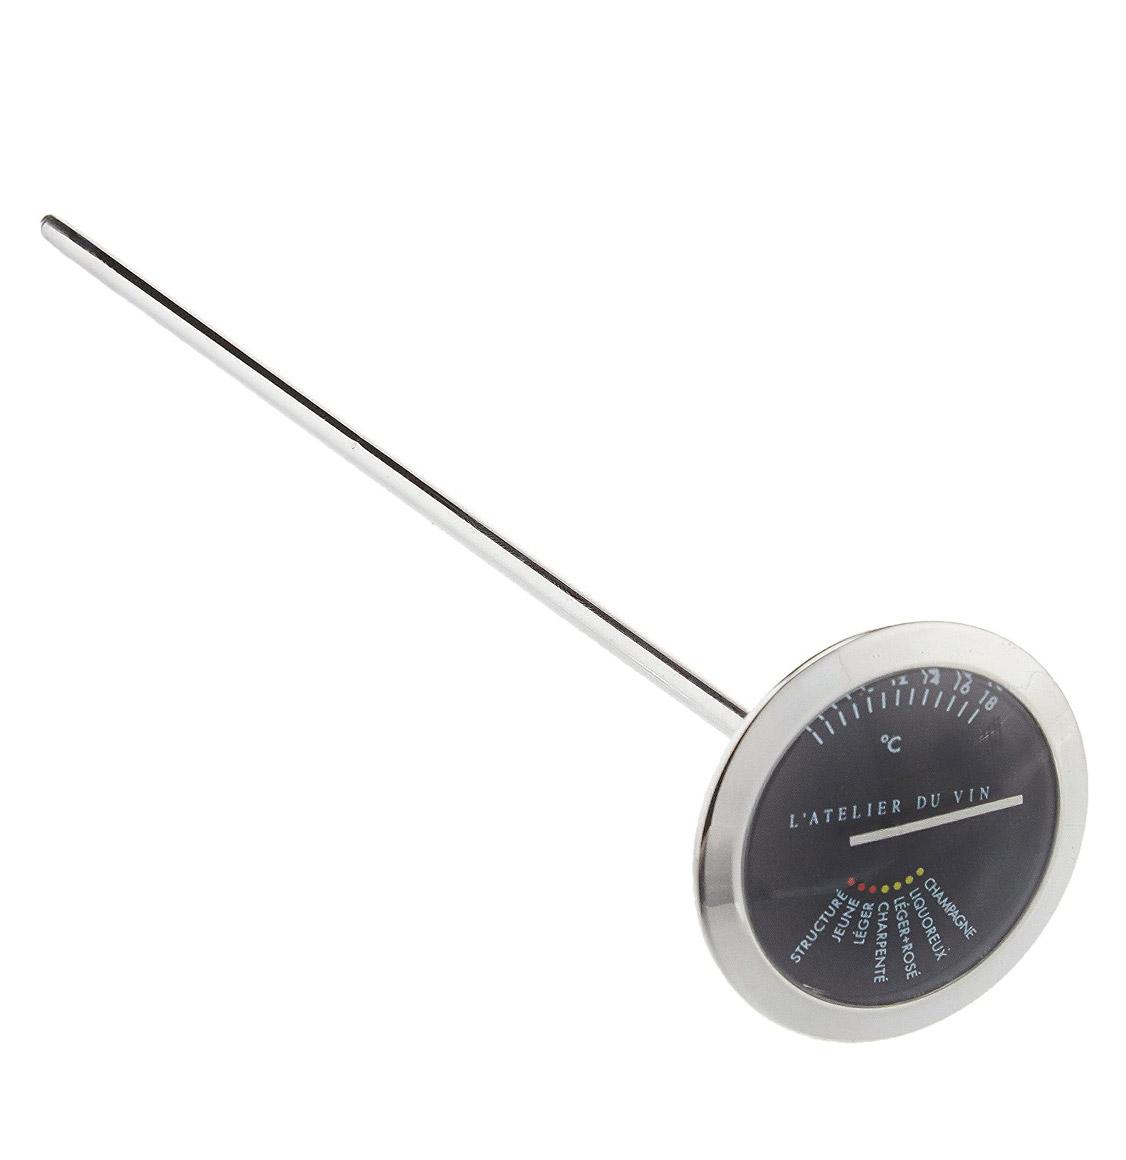 L' Atelier Du Vin Wine Thermometer